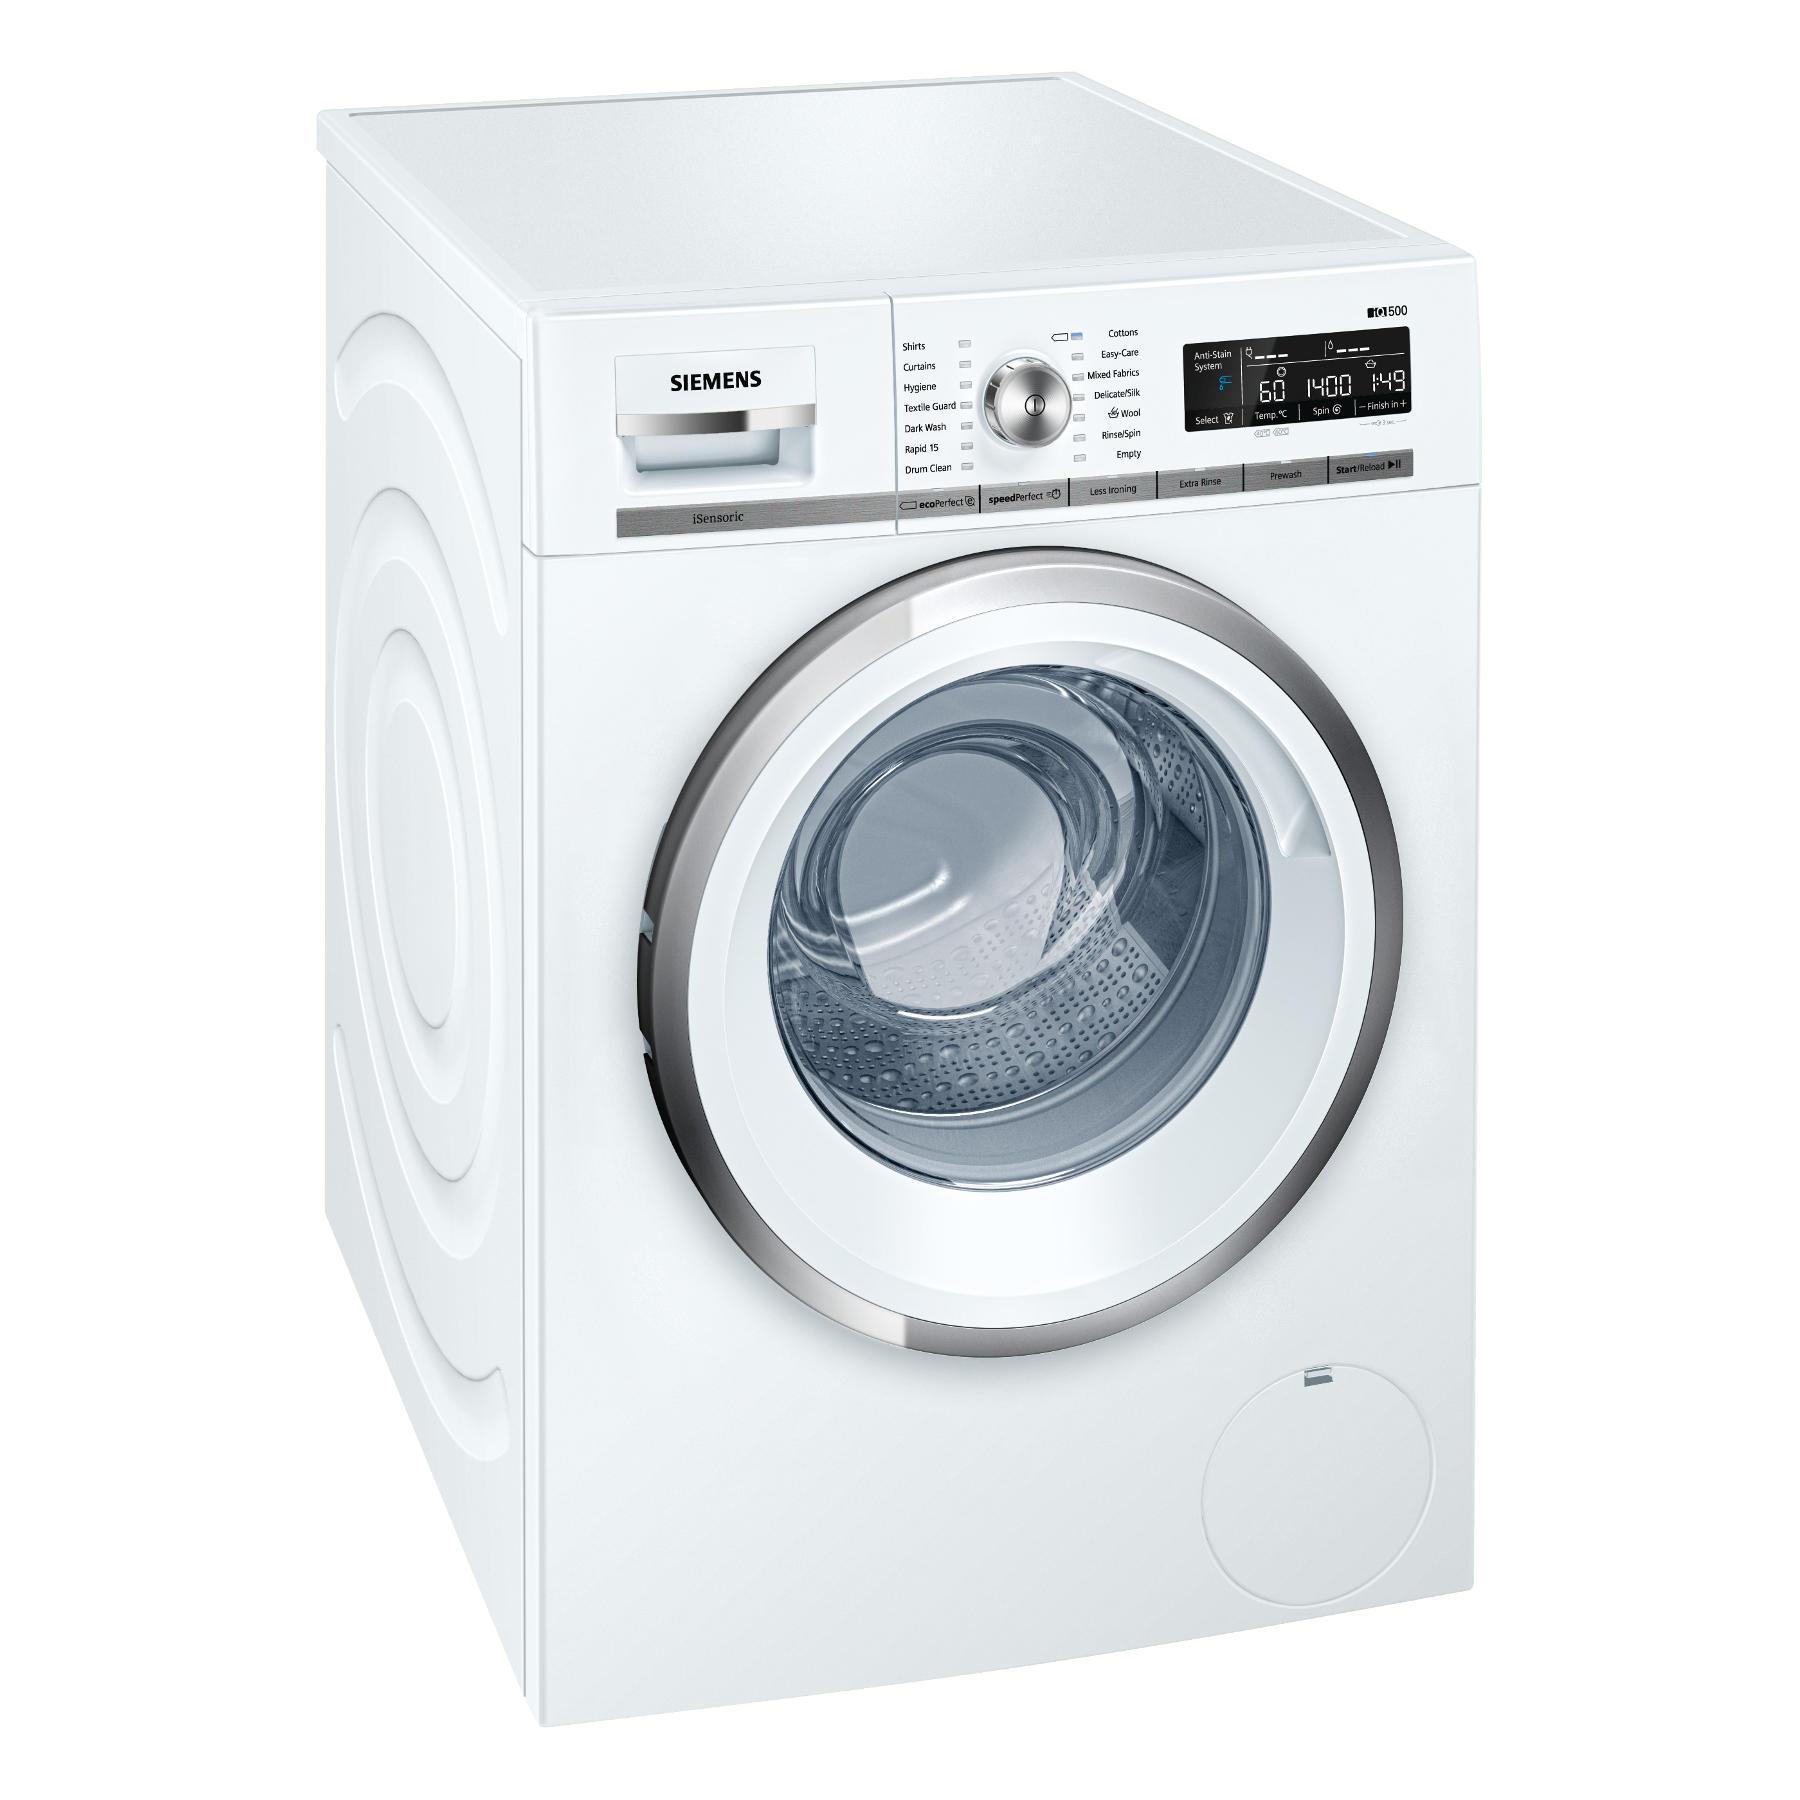 Siemens WM14W590GB iQ500 Front loading automatic washing machine